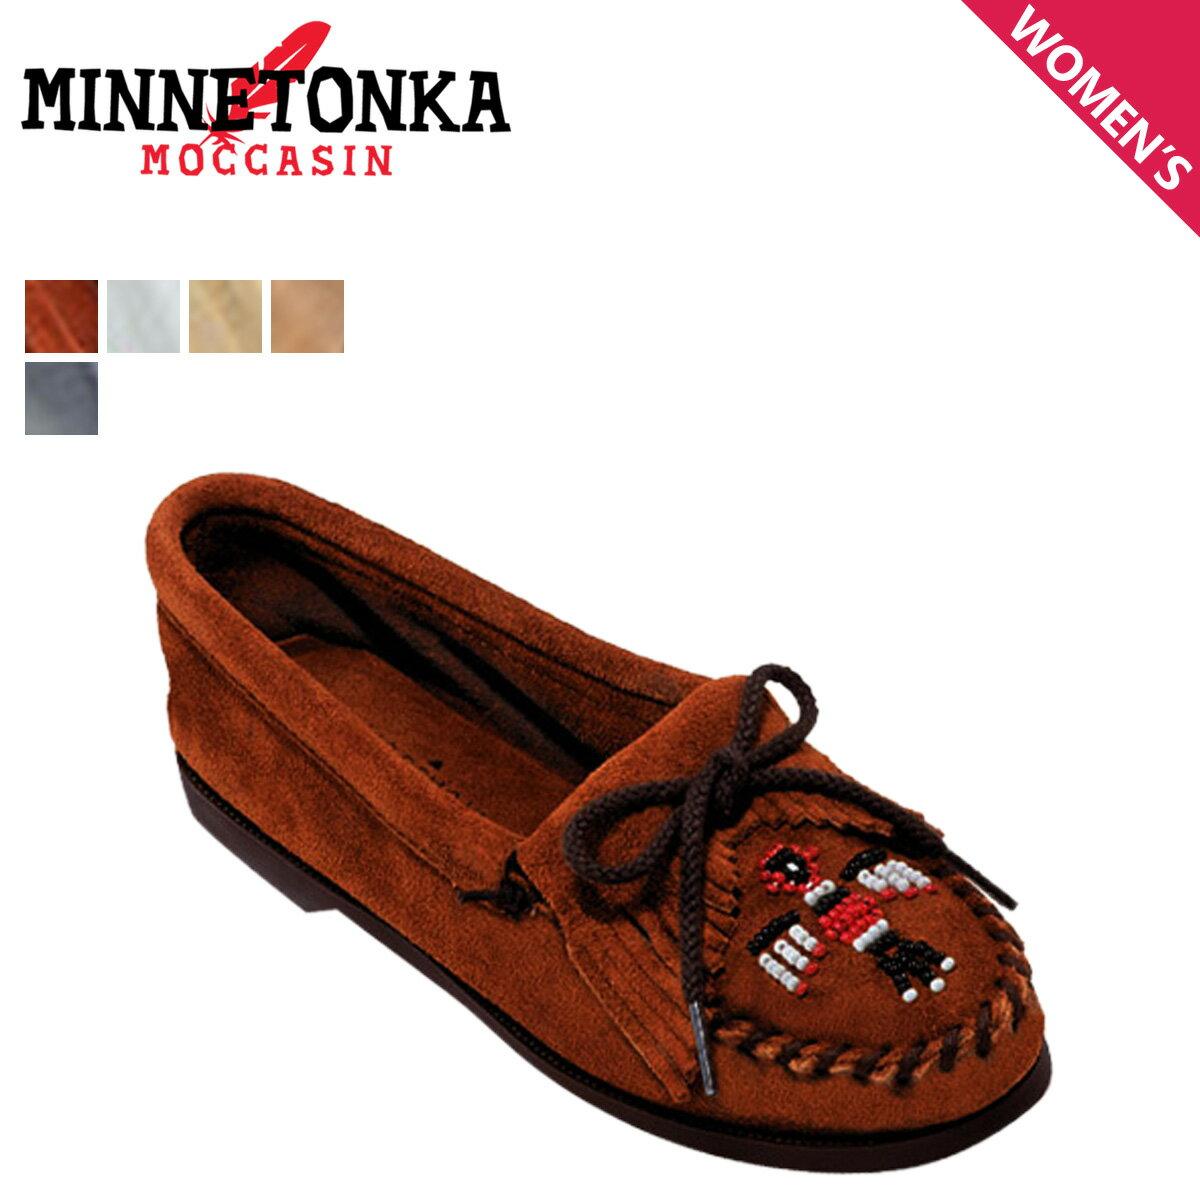 MINNETONKA THUNDERBIRD BOAT SOLE ミネトンカ モカシン サンダーバード ボートソール レディース